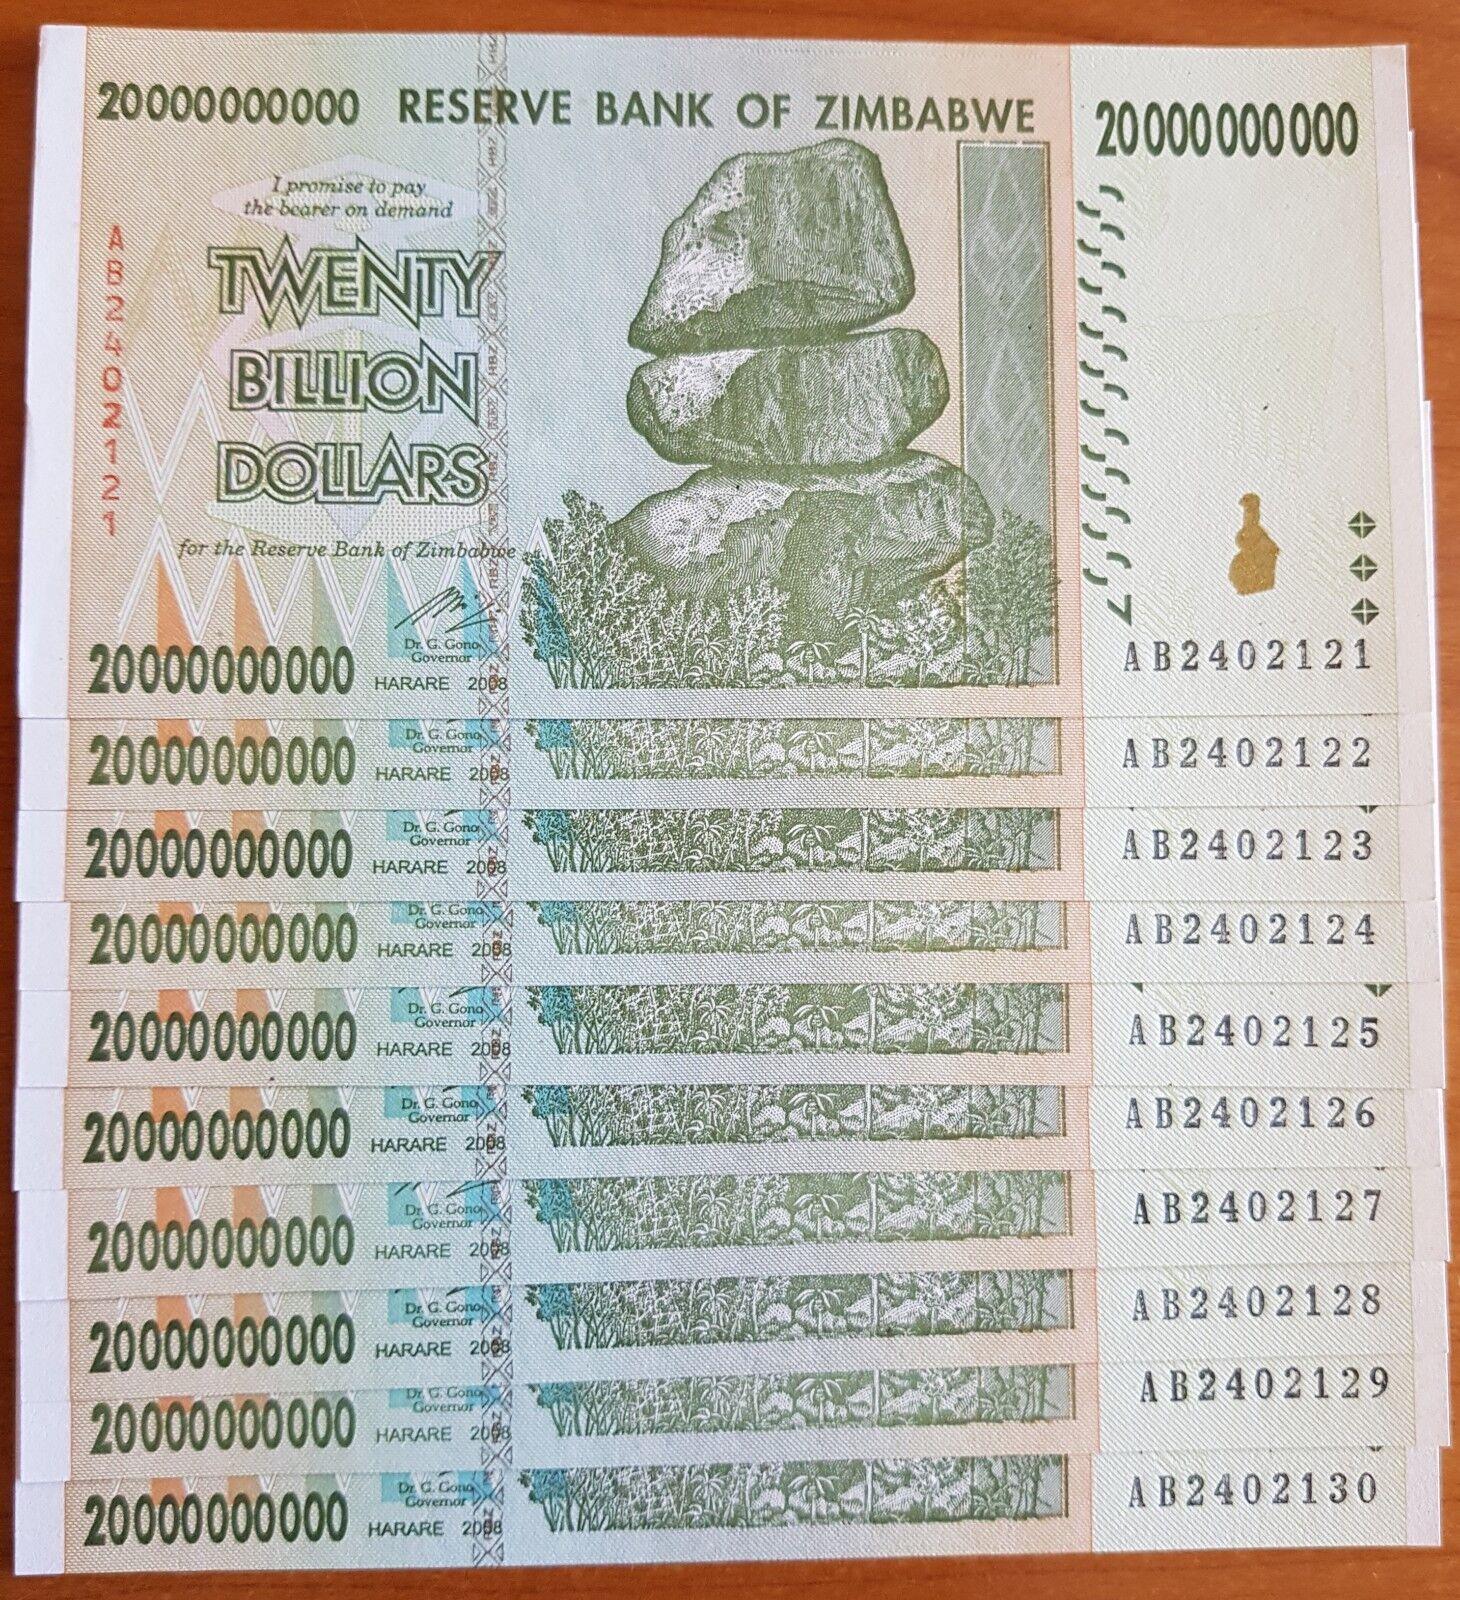 Zimbabwe 20 Billion Dollar x 5 Banknotes AA//AB 2008 aUNC Currency P86